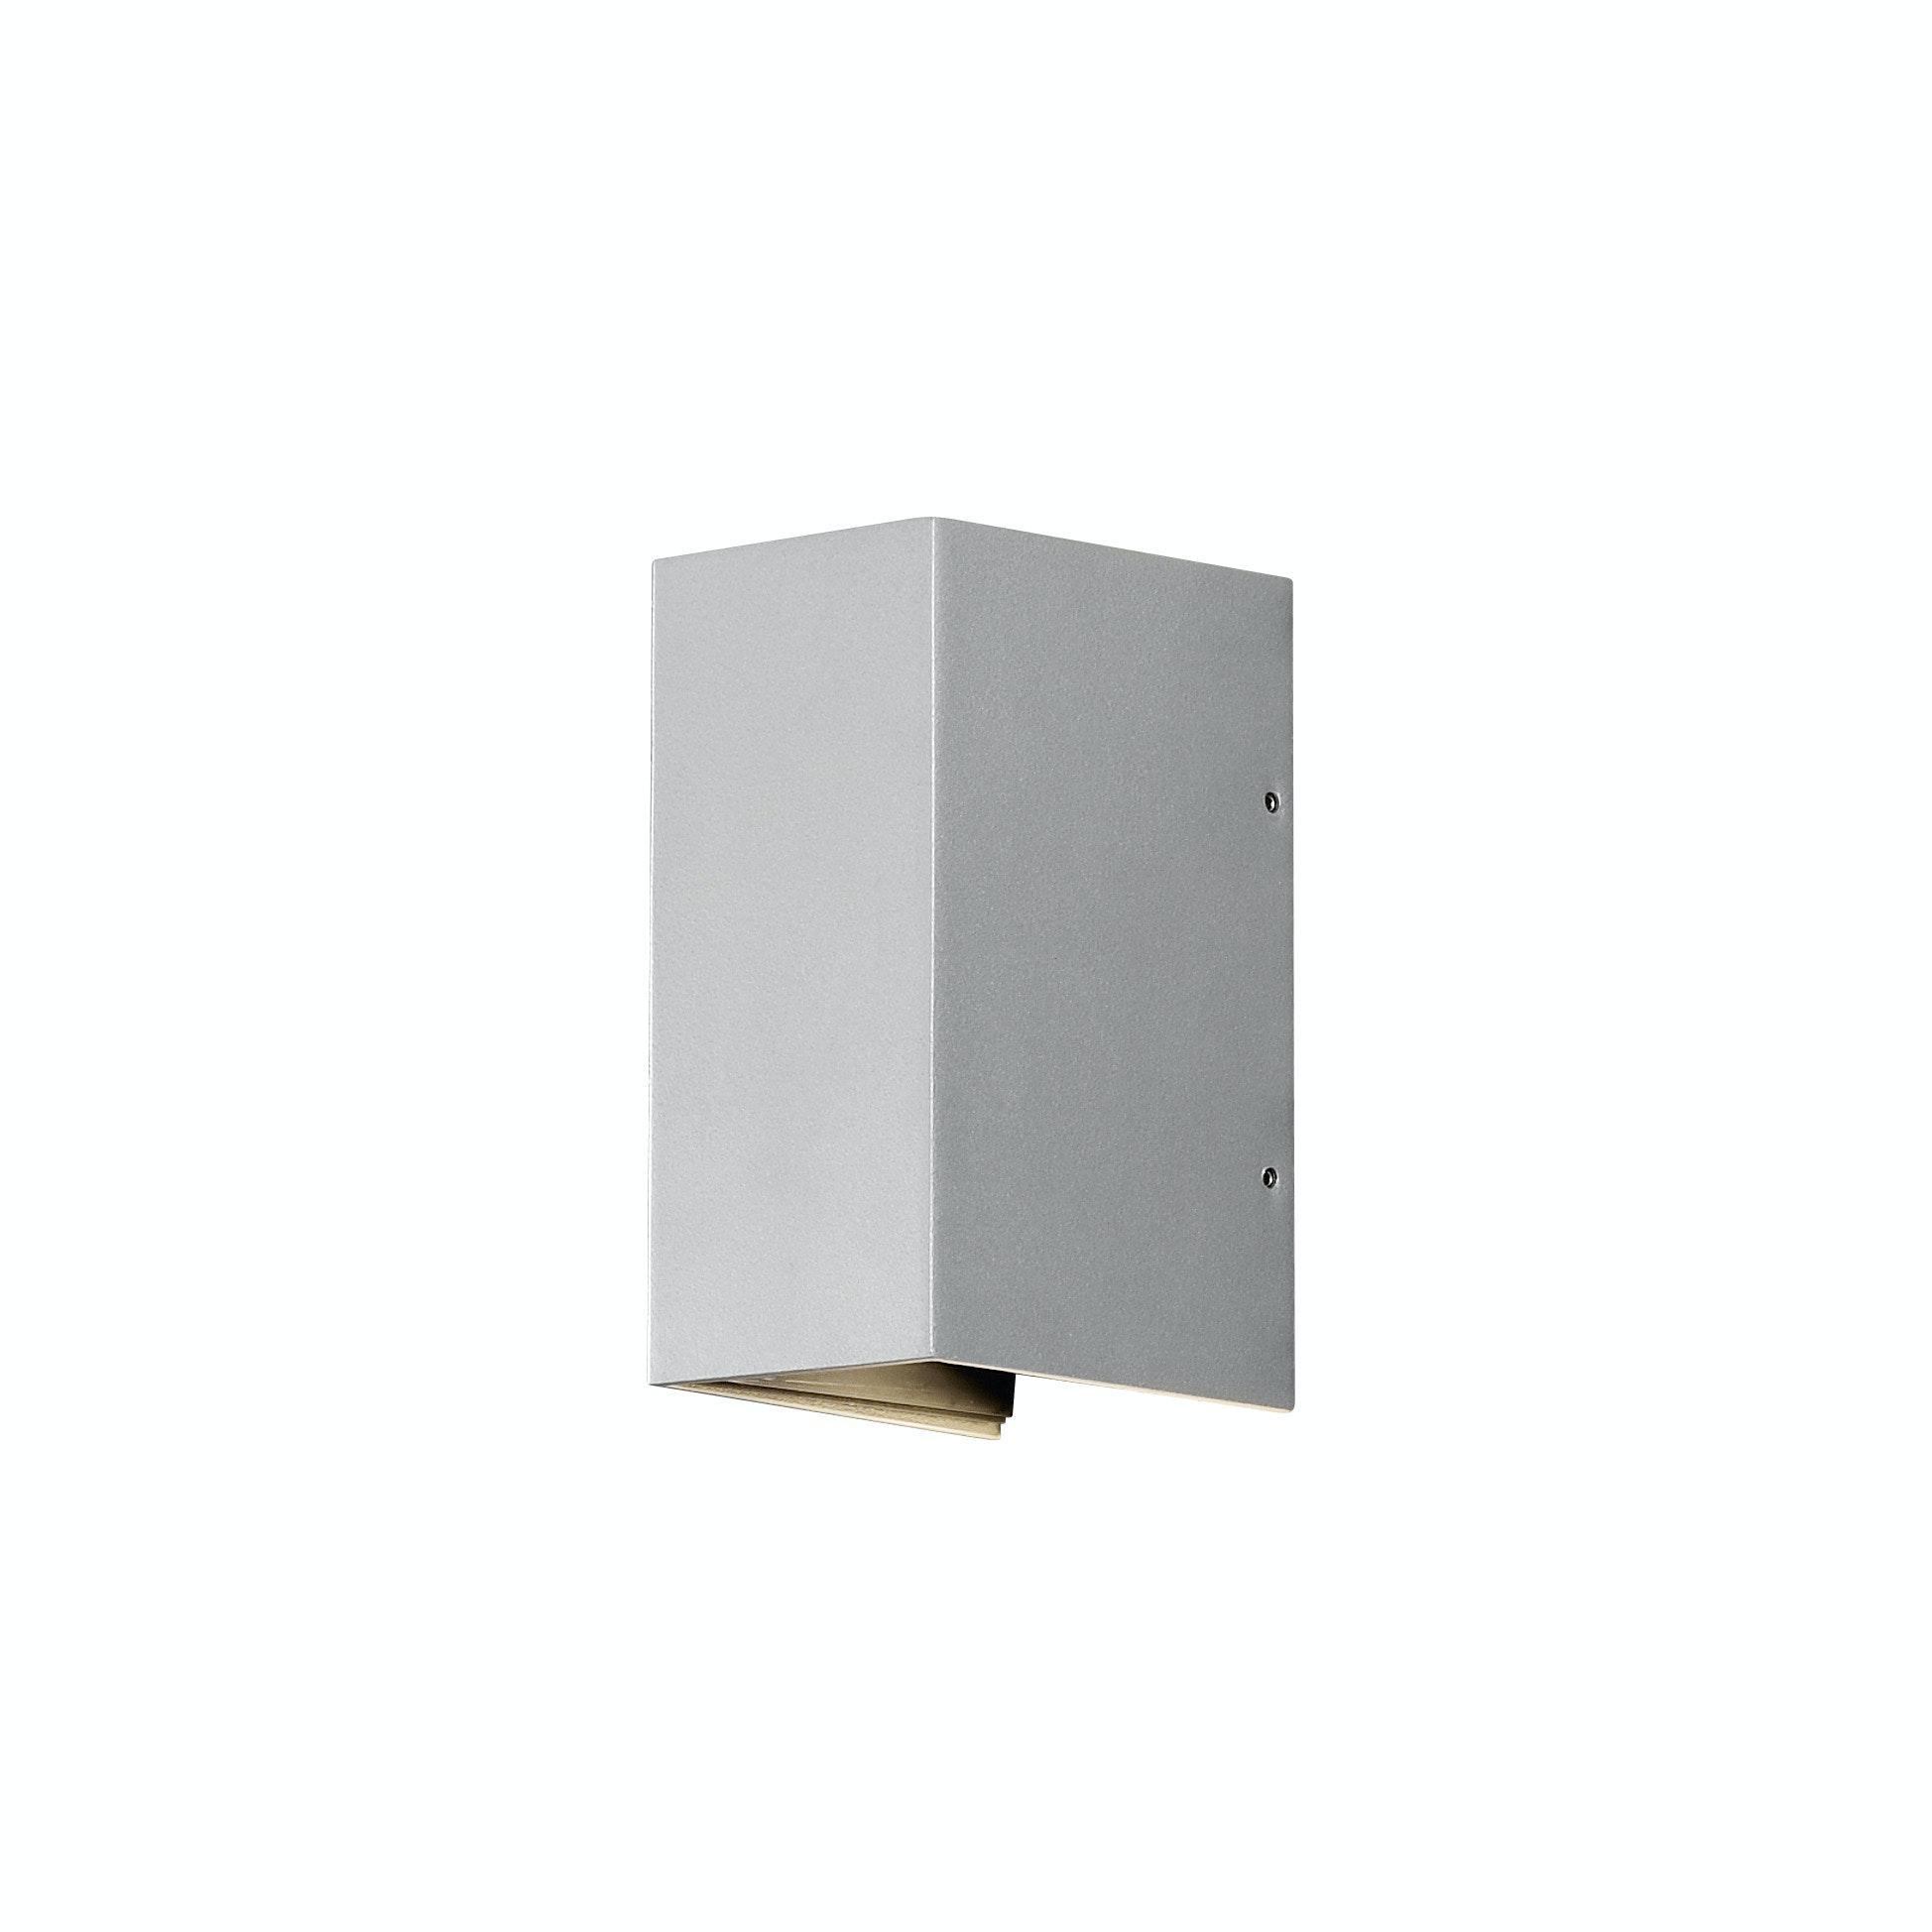 Vägglykta Konstsmide Cremona LED grå 2x3w